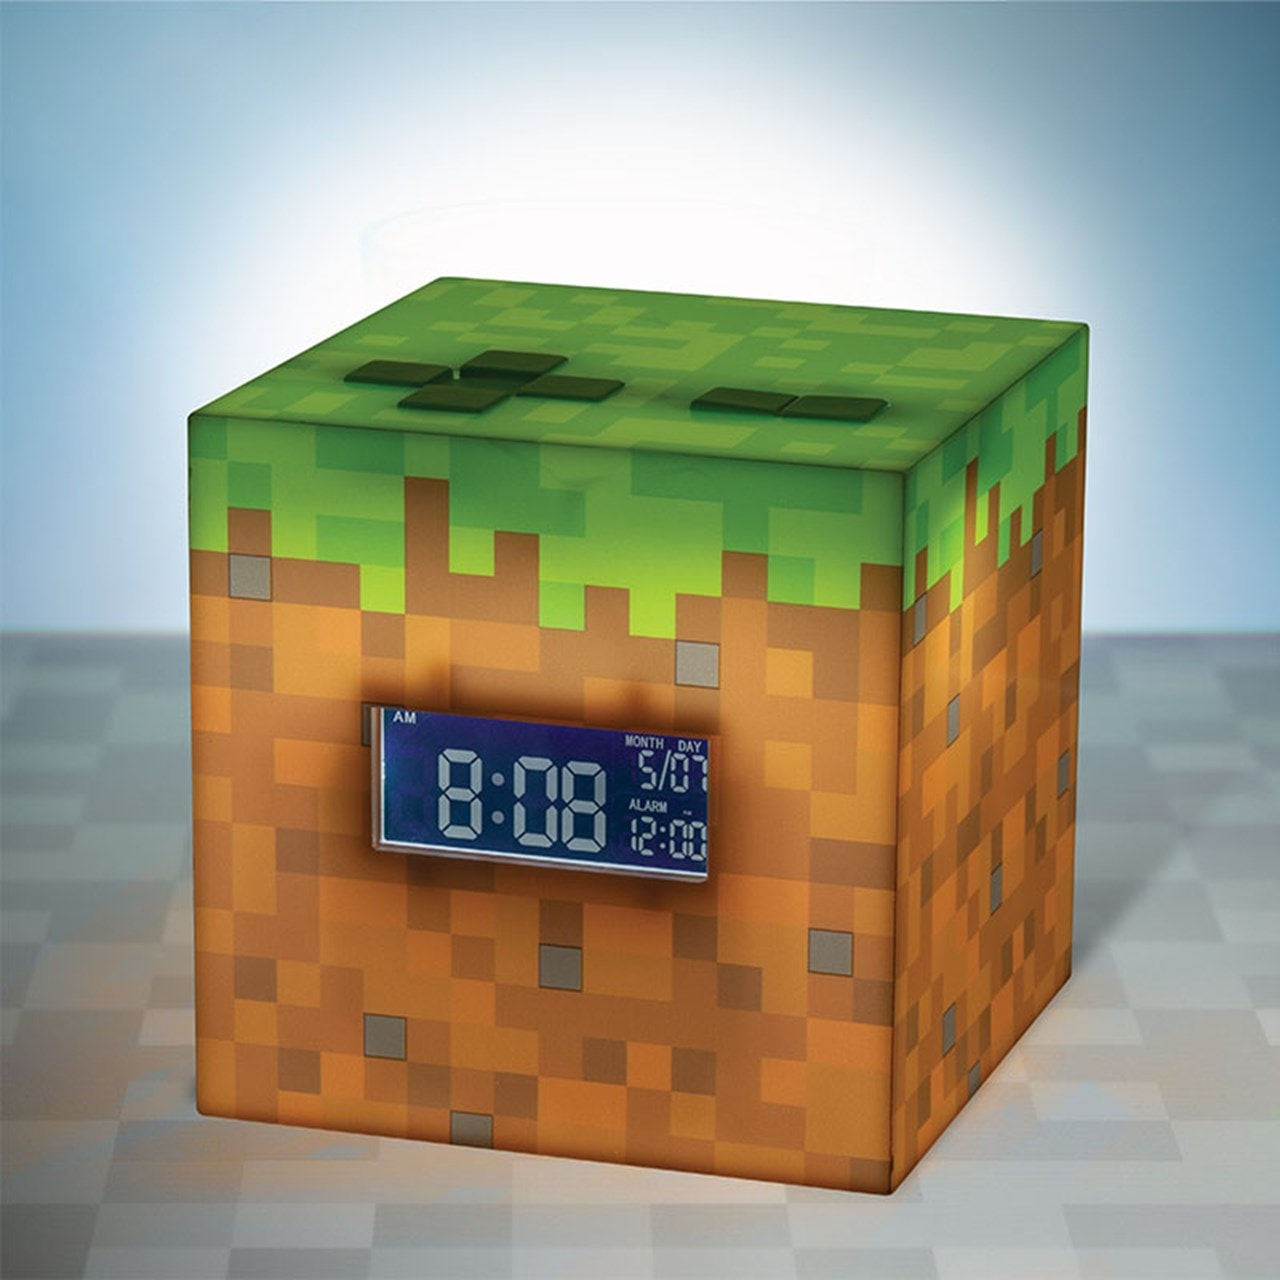 Minecraft Alarm Clock - 1